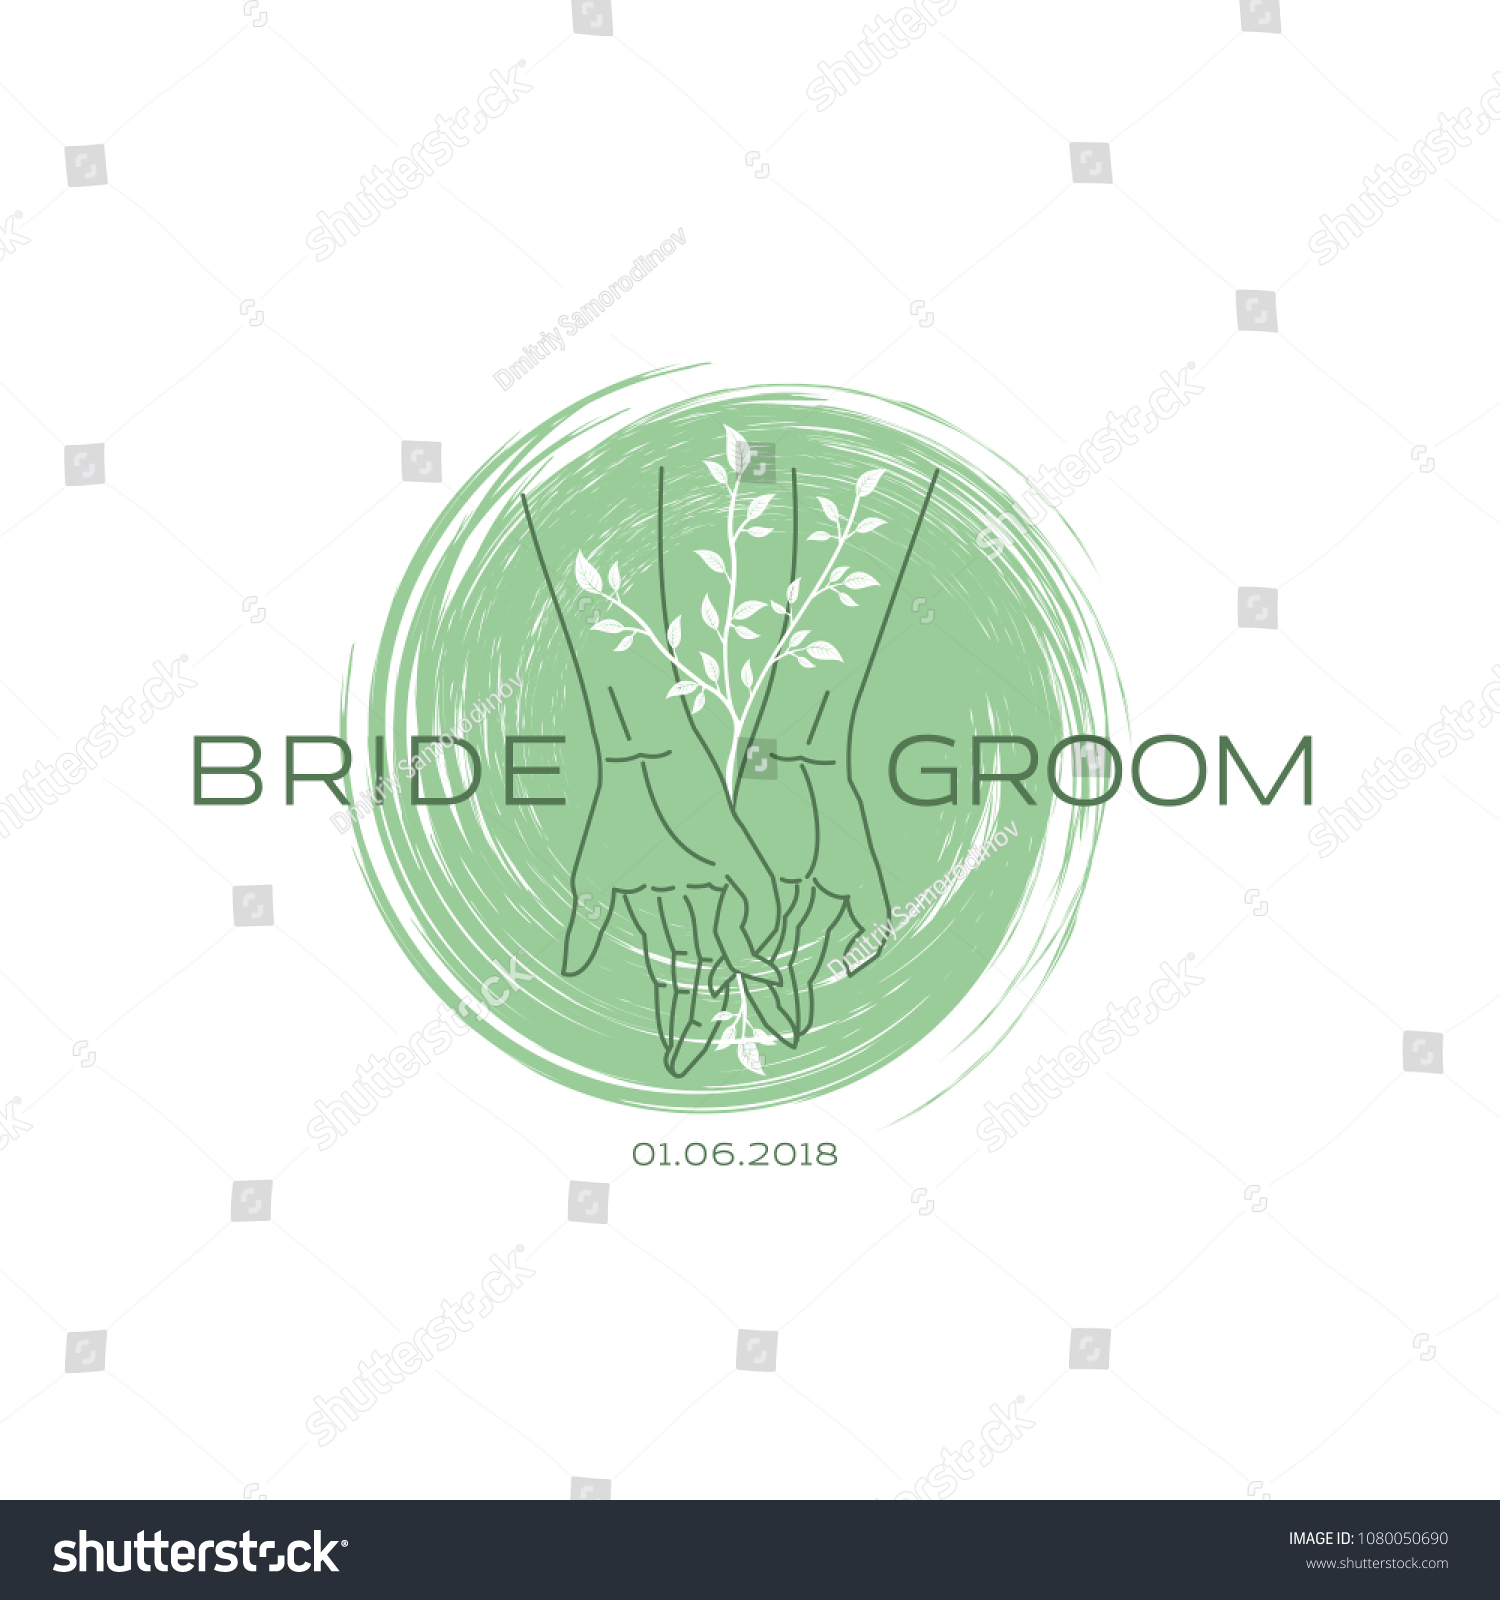 elegant design templates wedding card wedding stock vector royalty